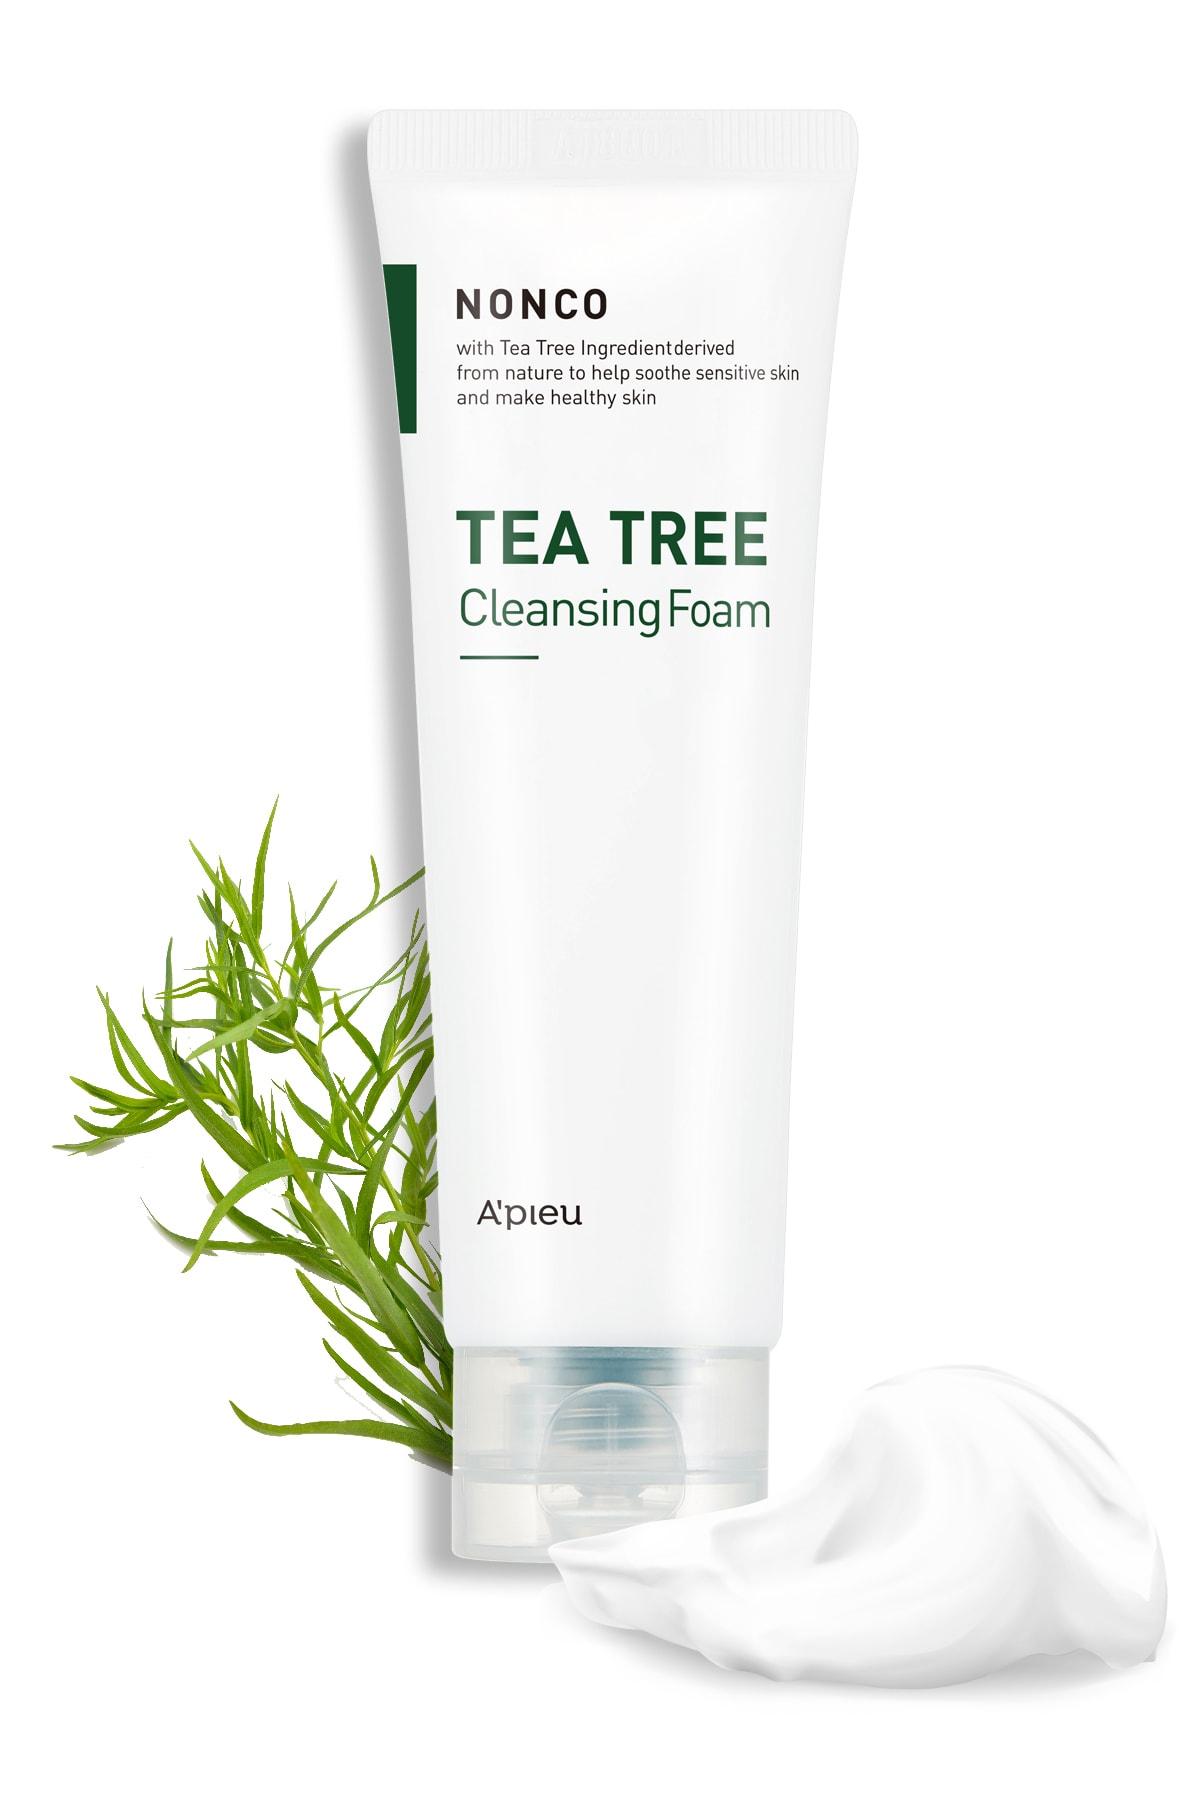 Missha Yüz Temizleyici Köpük - A'PIEU Nonco Tea Tree Cleansing Foam